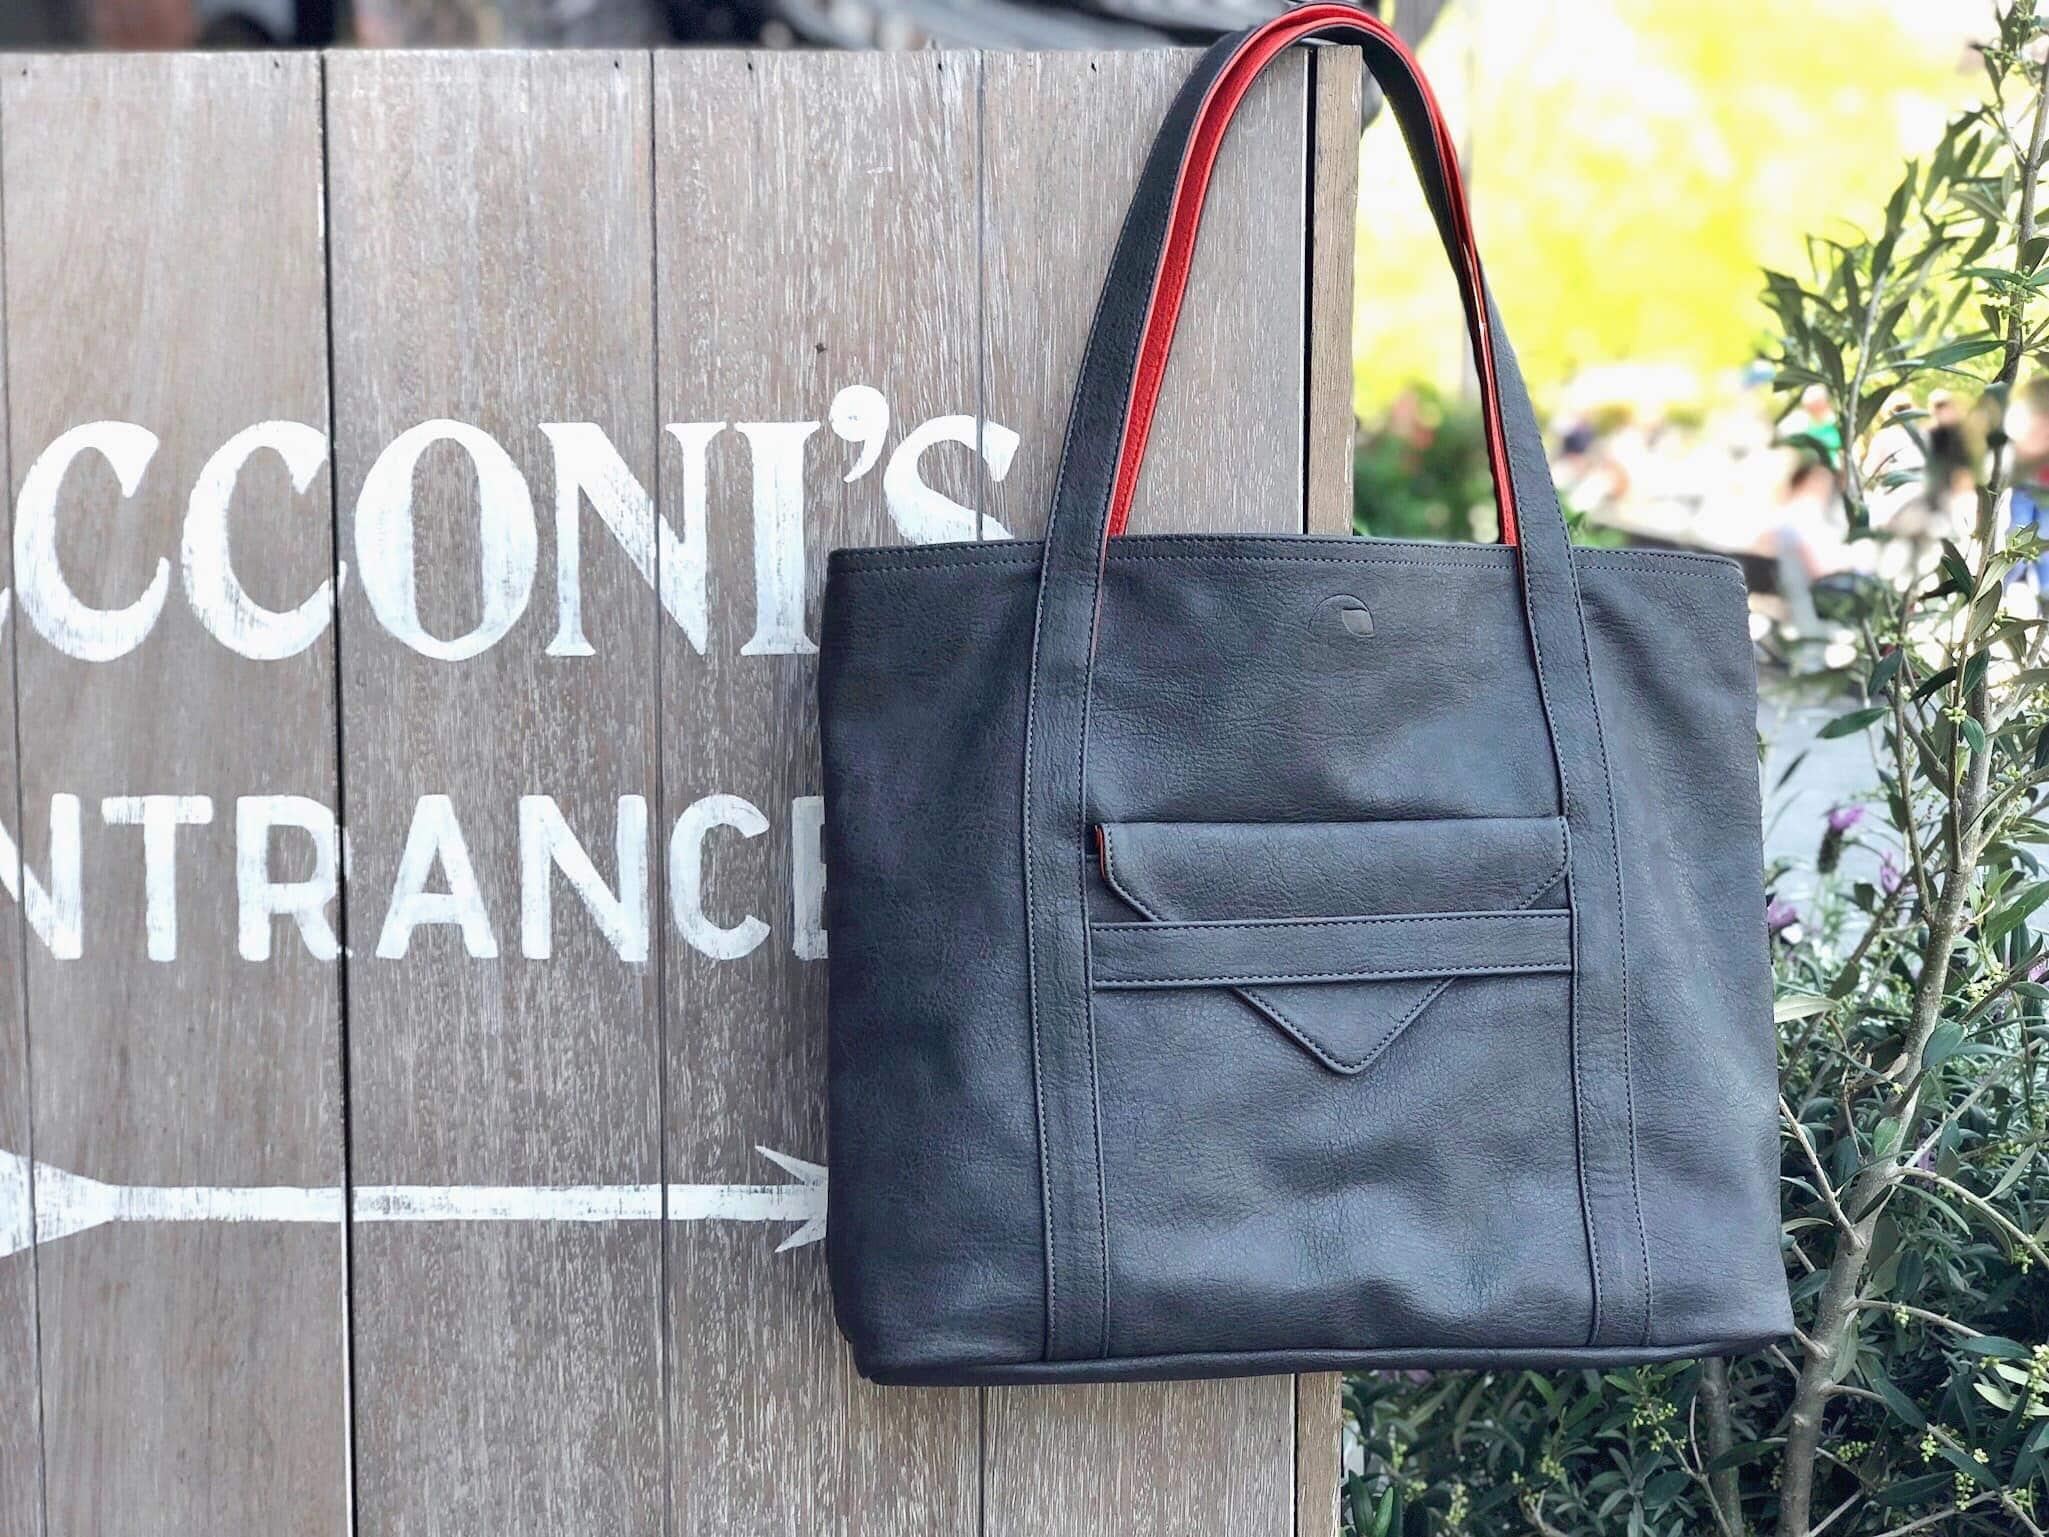 vegan leather handbag and tote purse